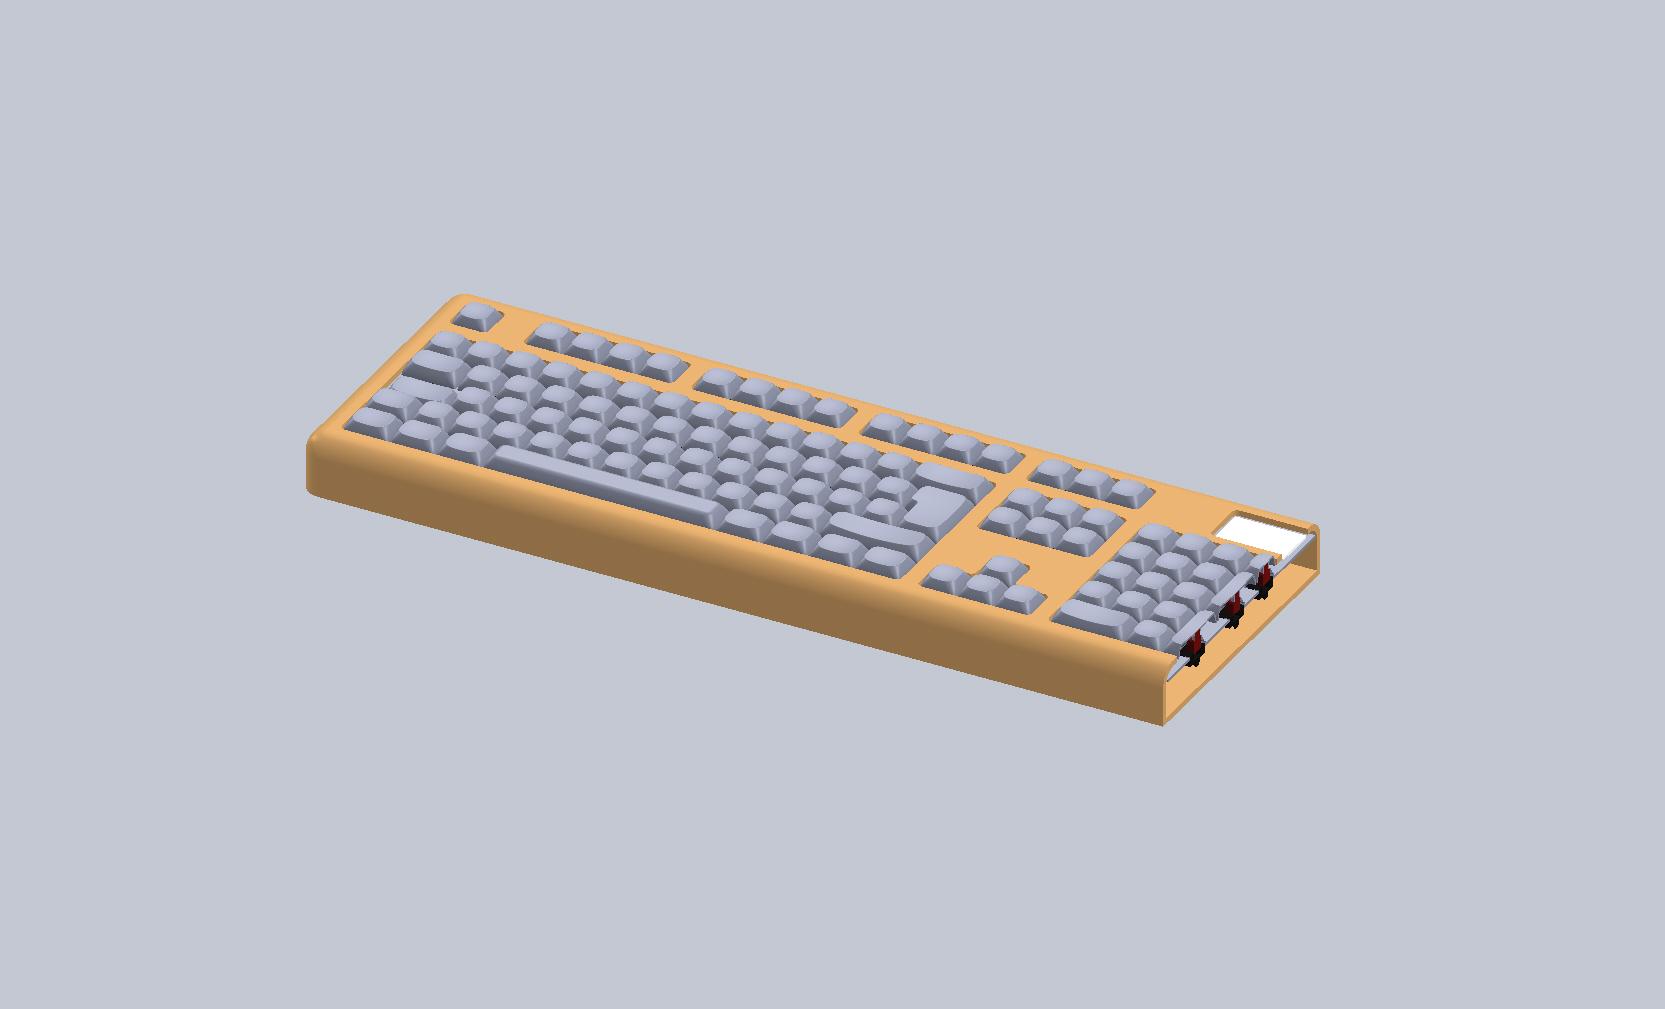 keyboard study 1 9.JPG